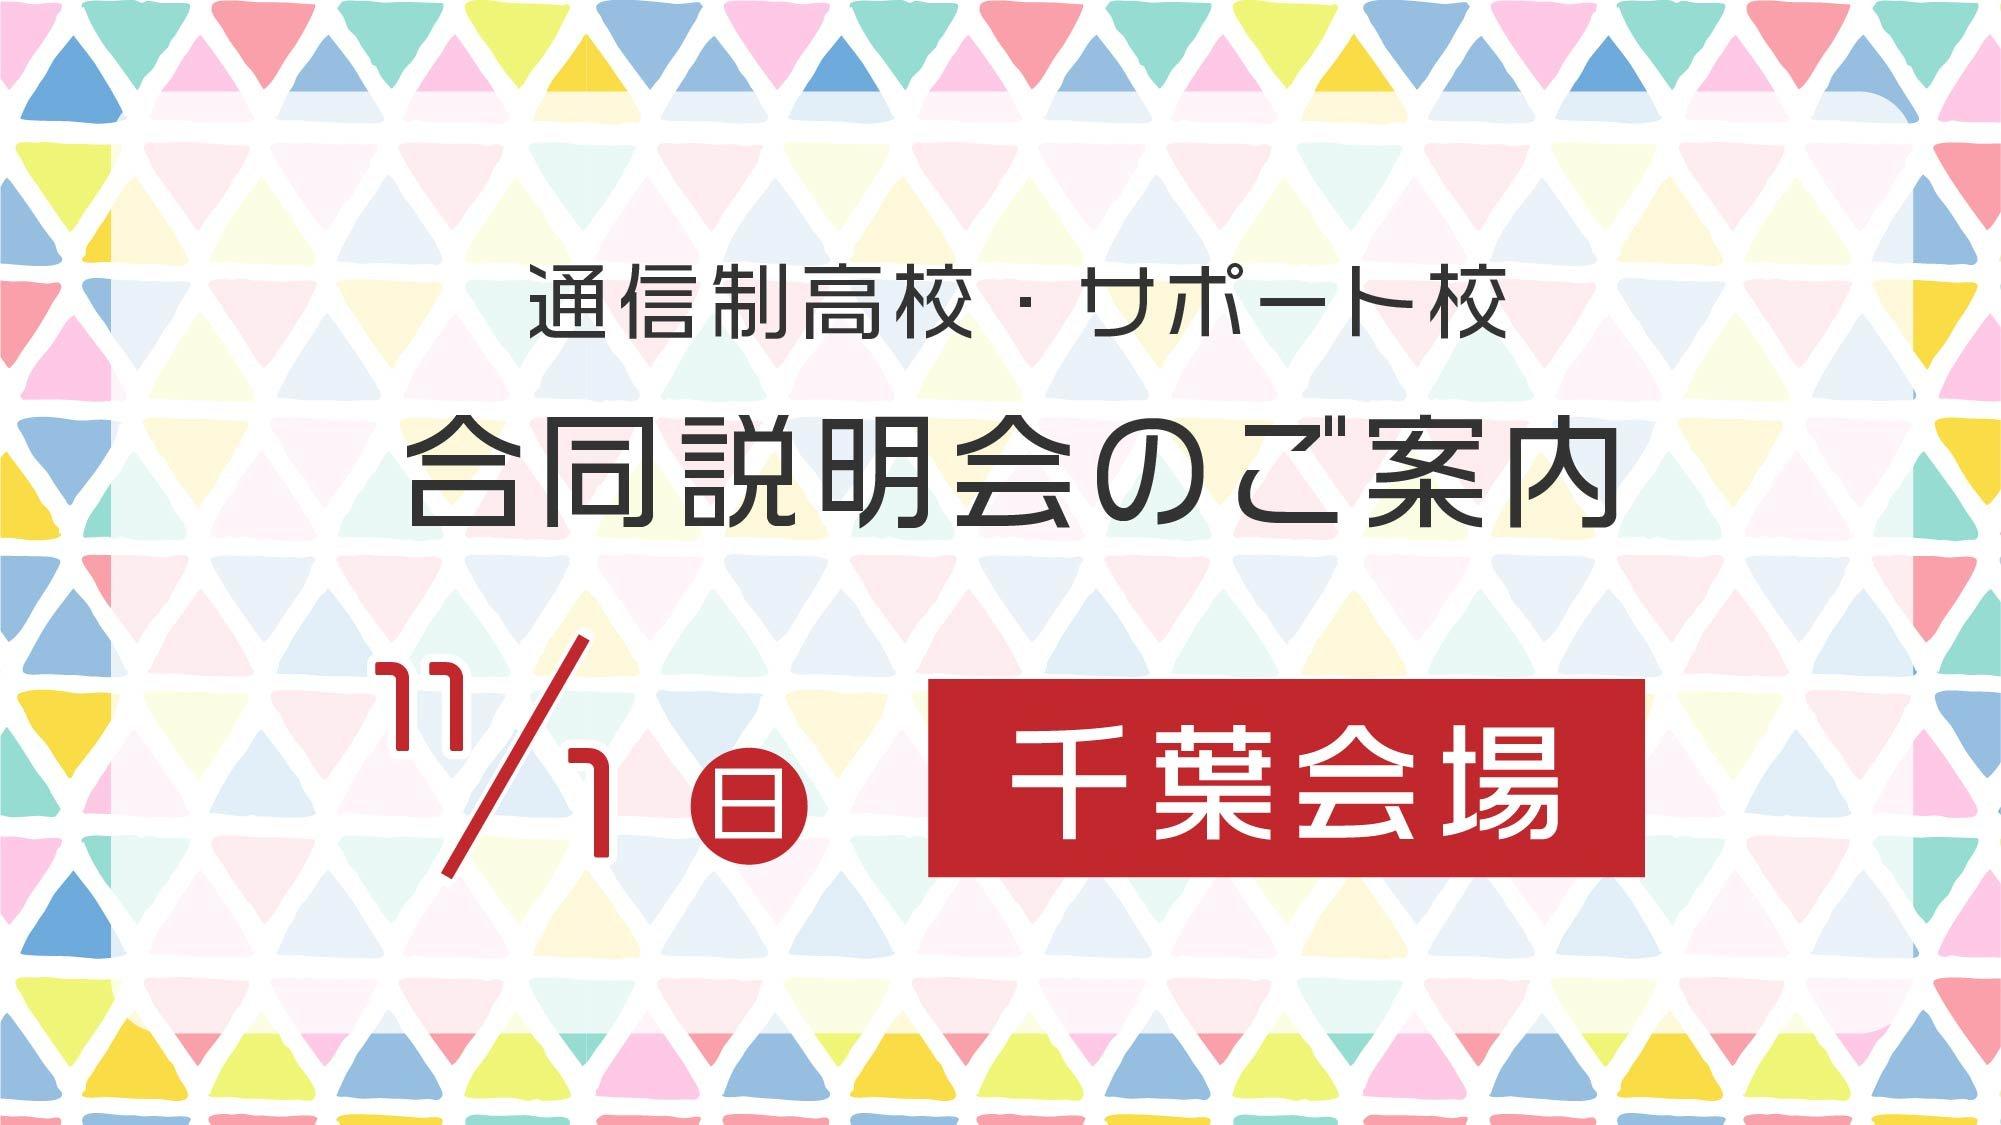 gousetsu_1101chiba-06.jpg